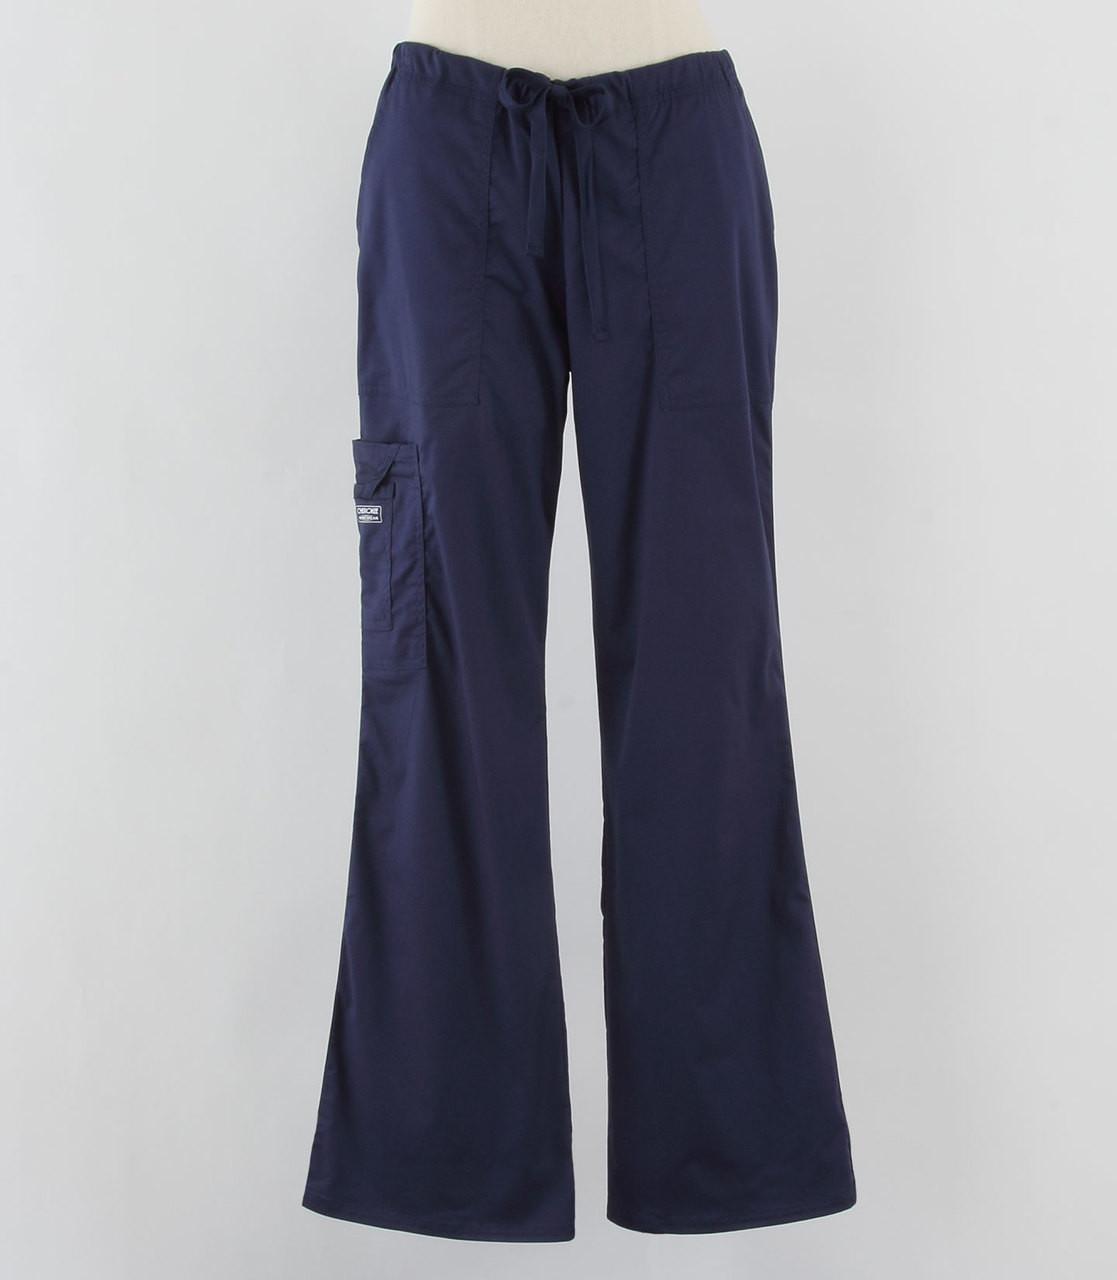 35927a7e61e Cherokee Workwear Core Stretch Womens Cargo Scrub Pants Navy - Scrub Med